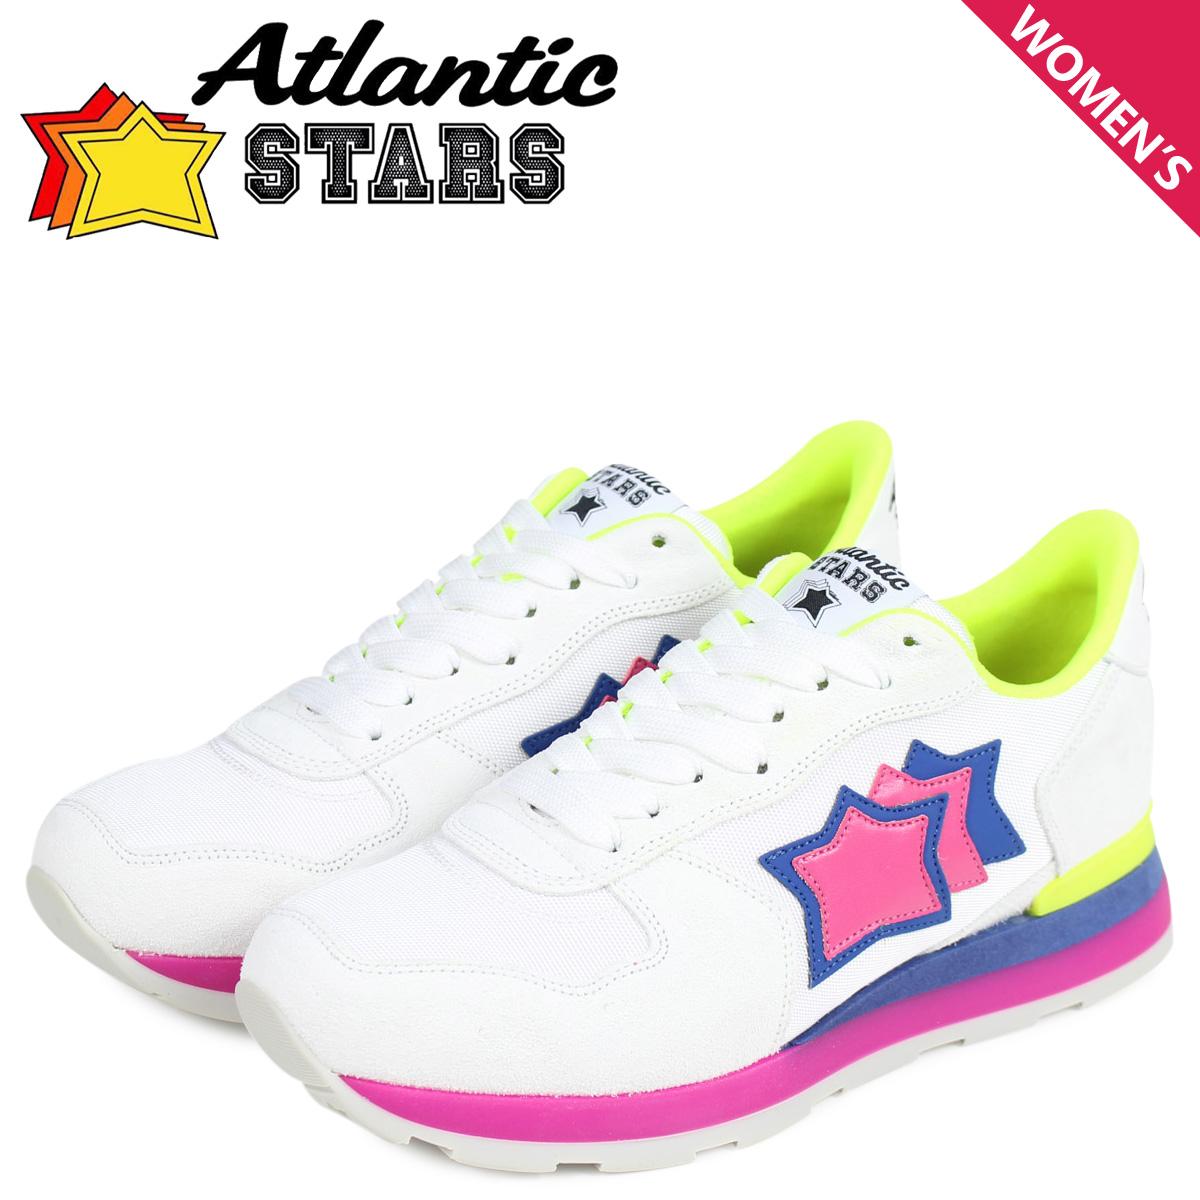 Atlantic STARS レディース スニーカー アトランティックスターズ ベガ VEGA BGF-62GF ホワイト